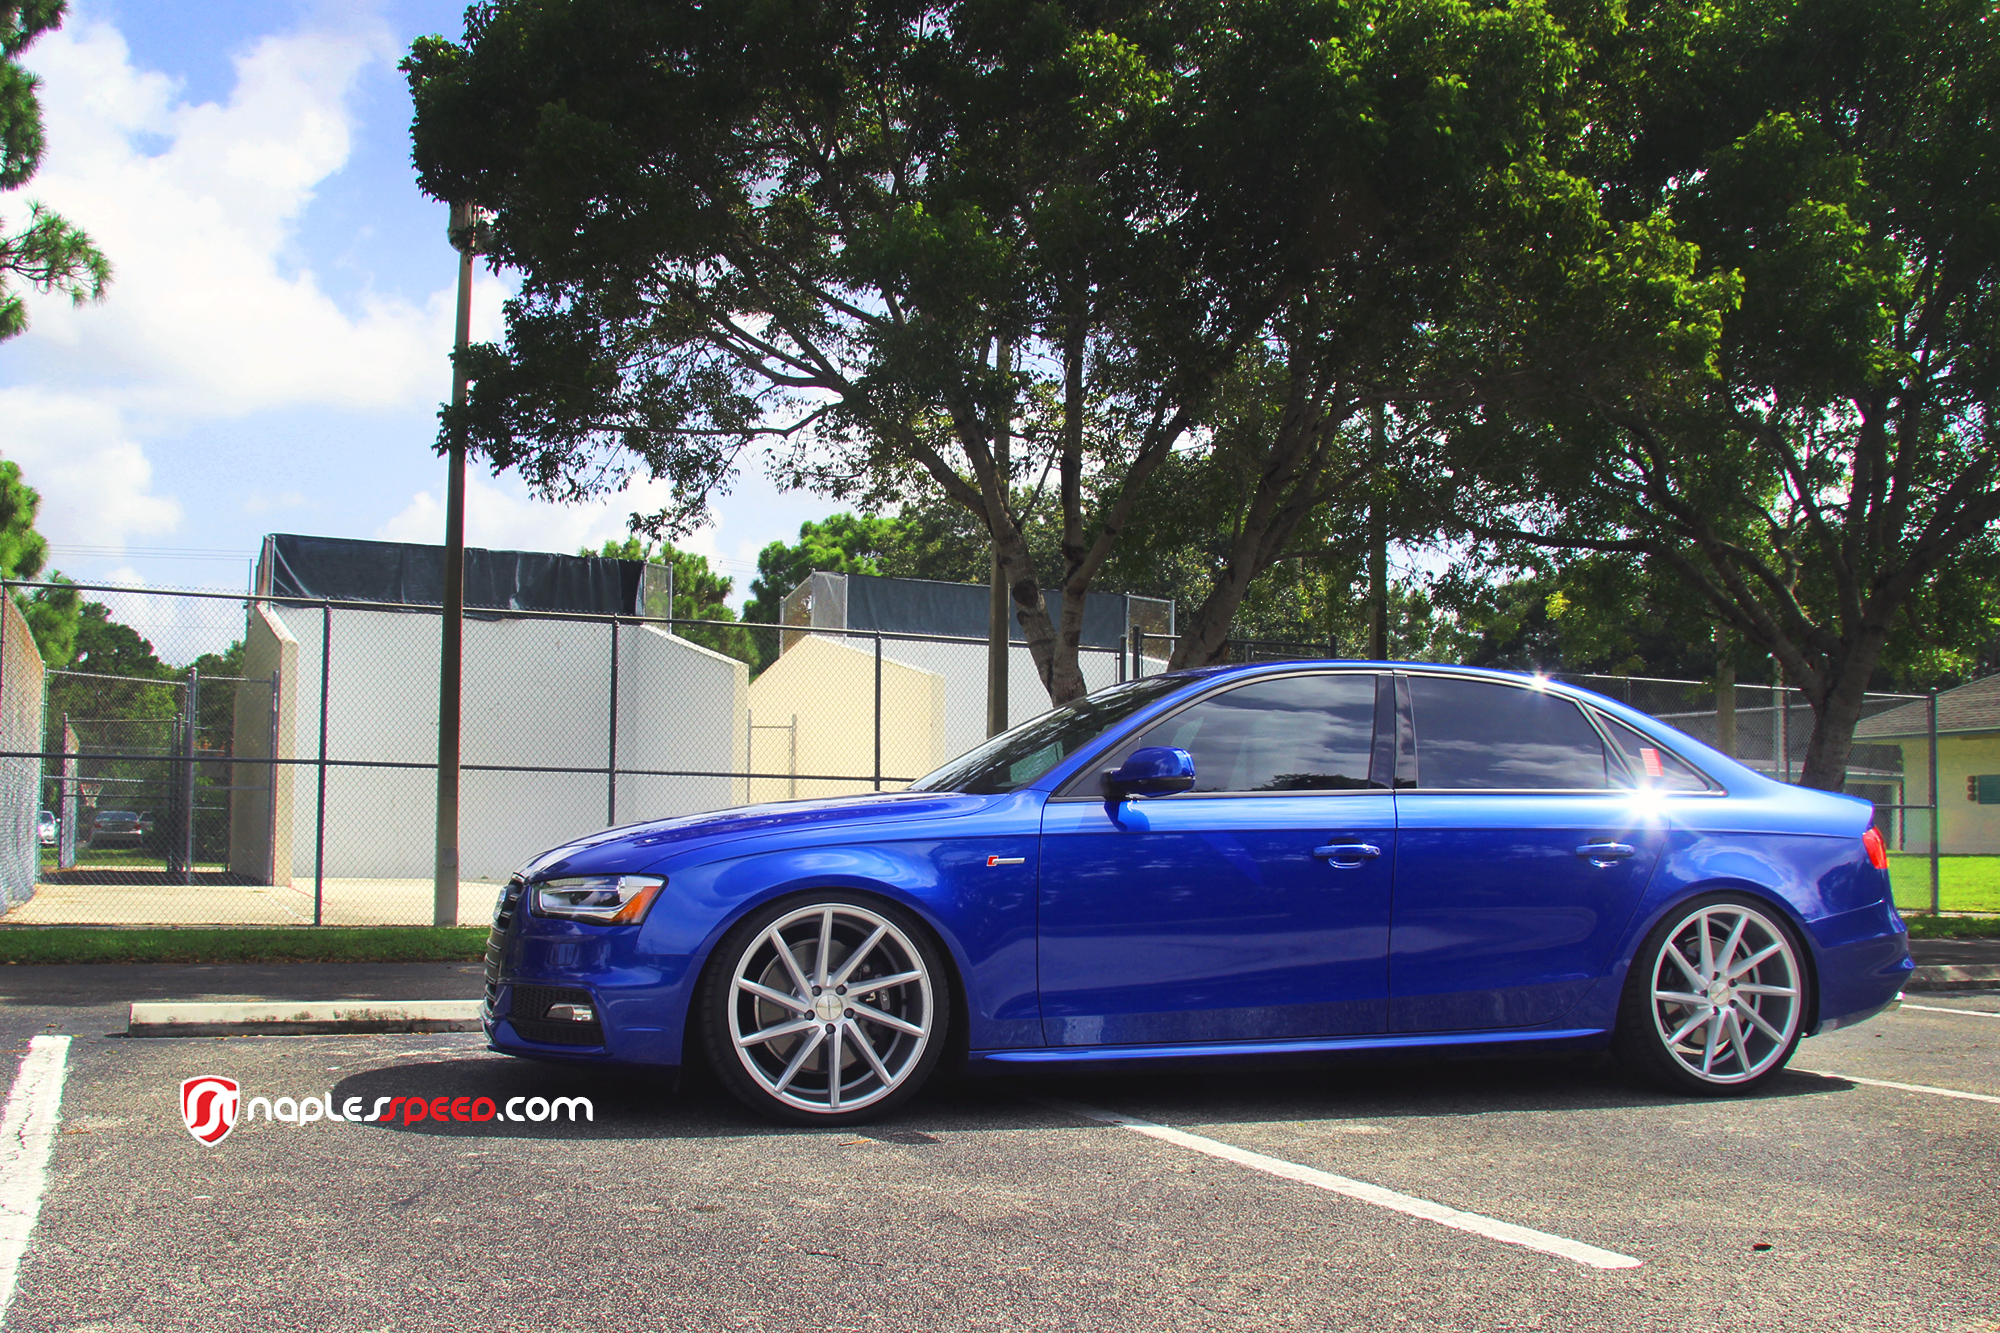 Audi s4 Black Optics Package Audi s4 Black Optic